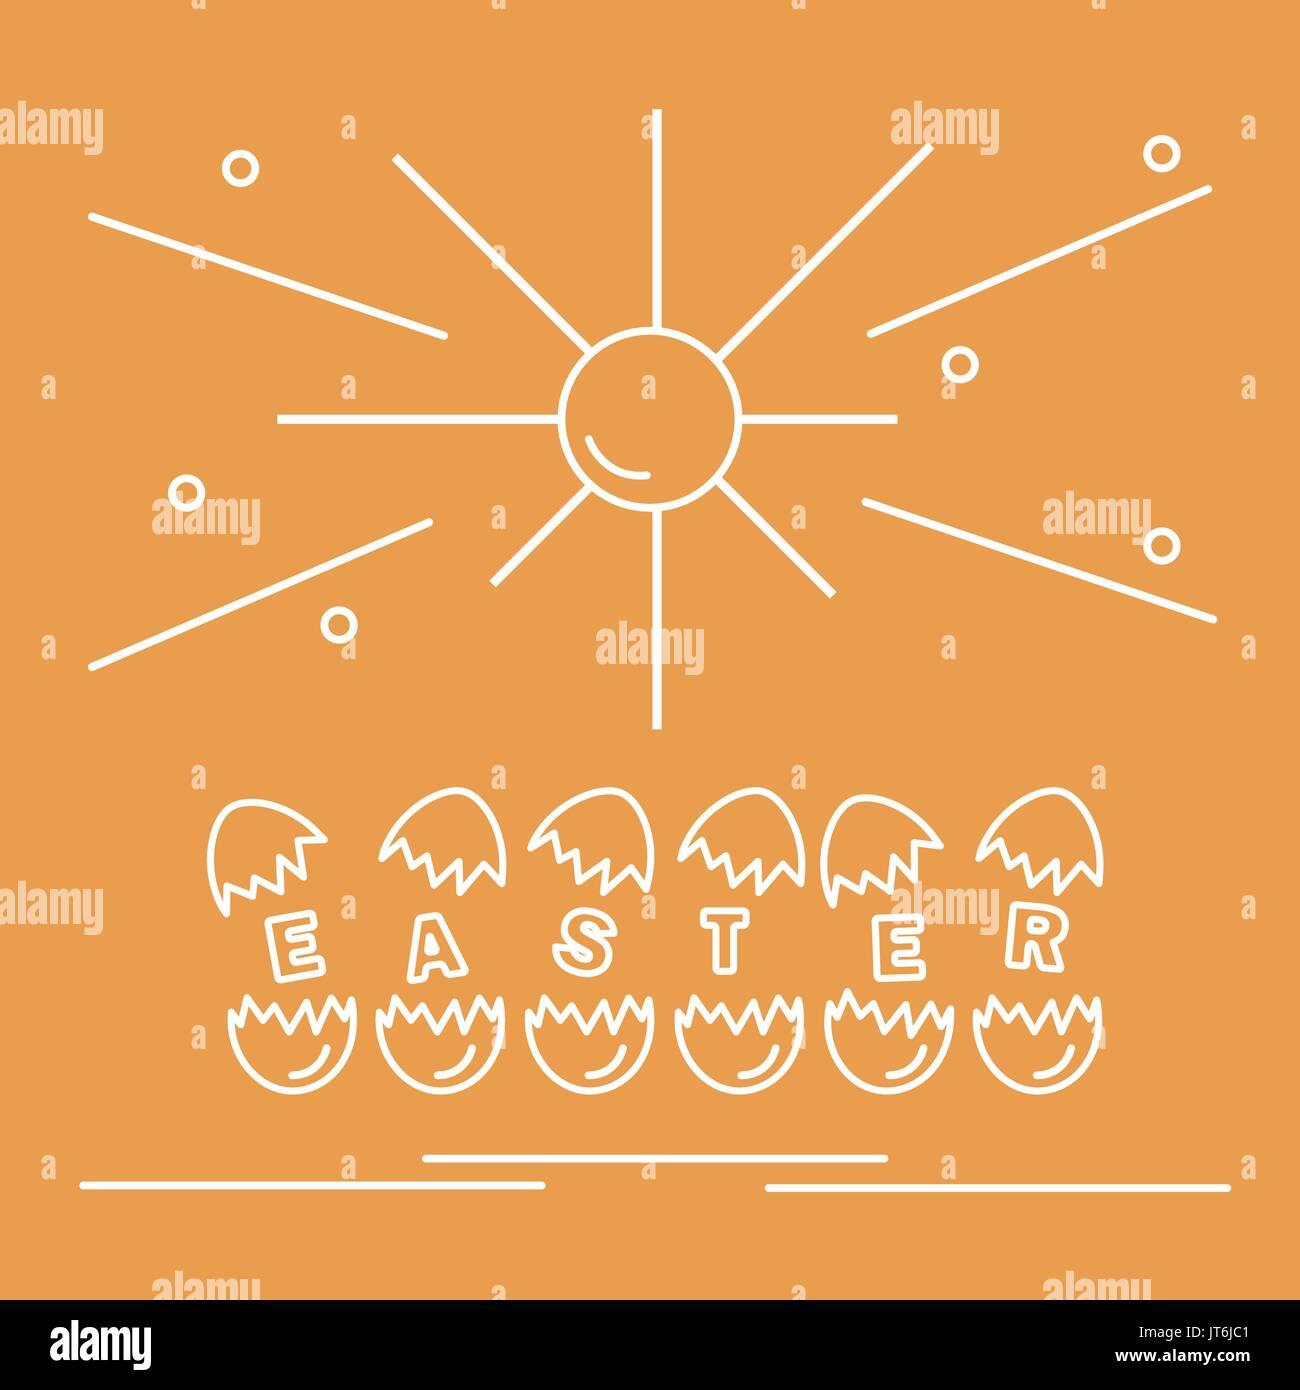 Cute Vector Illustration With Symbols For Easter Design For Banner